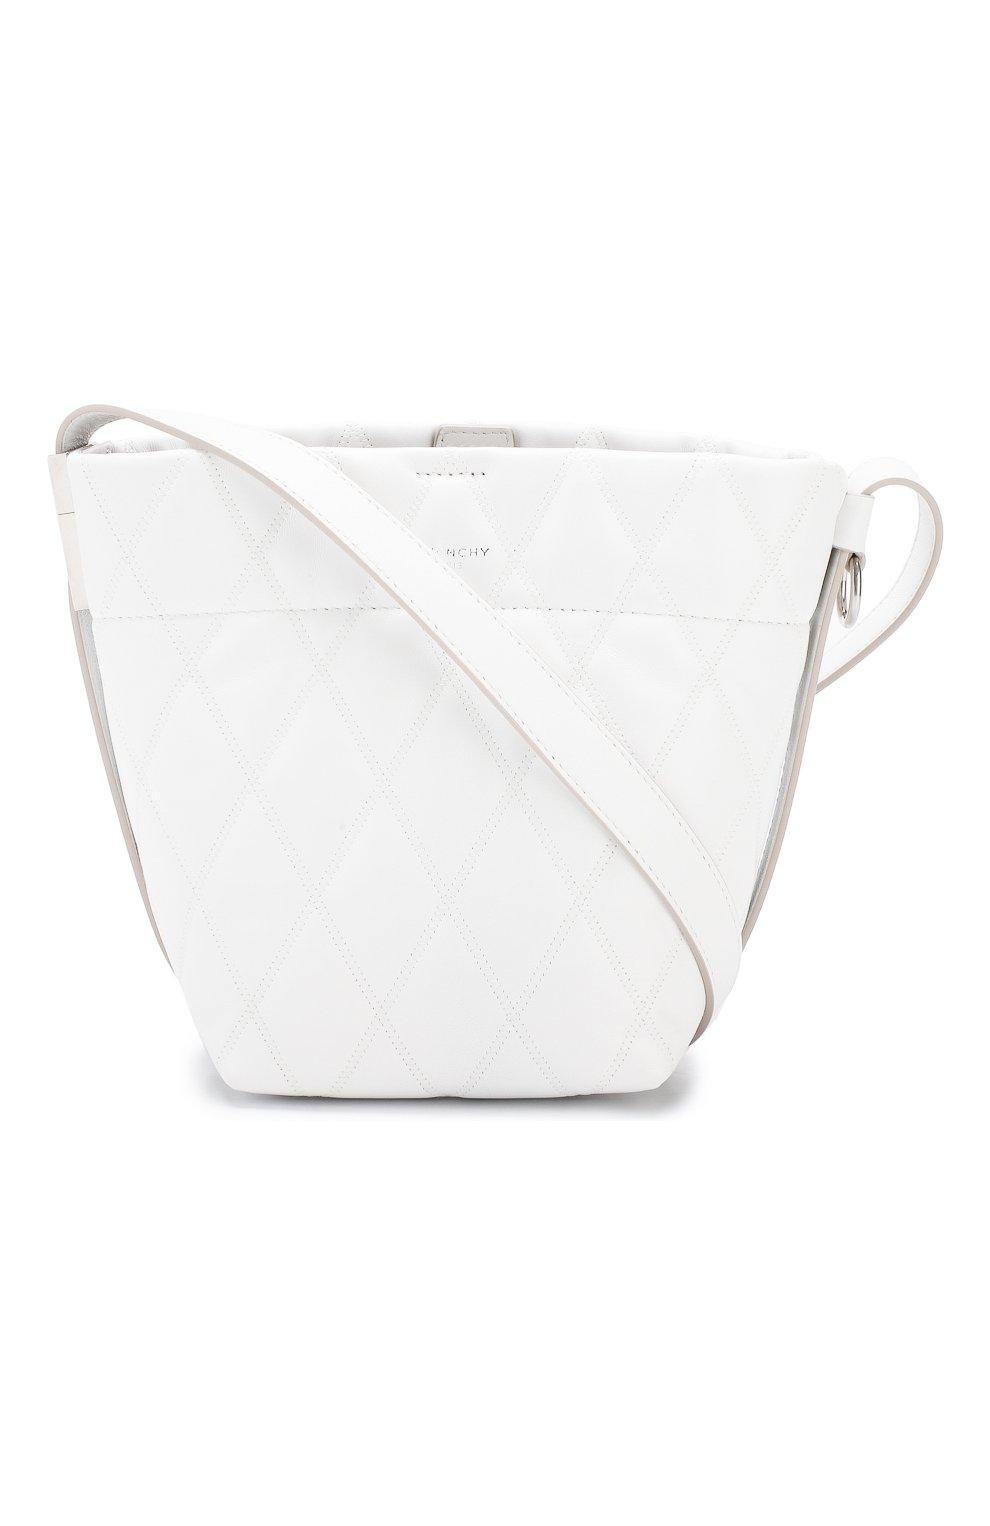 Сумка GV Bucket mini Givenchy белая цвета | Фото №6